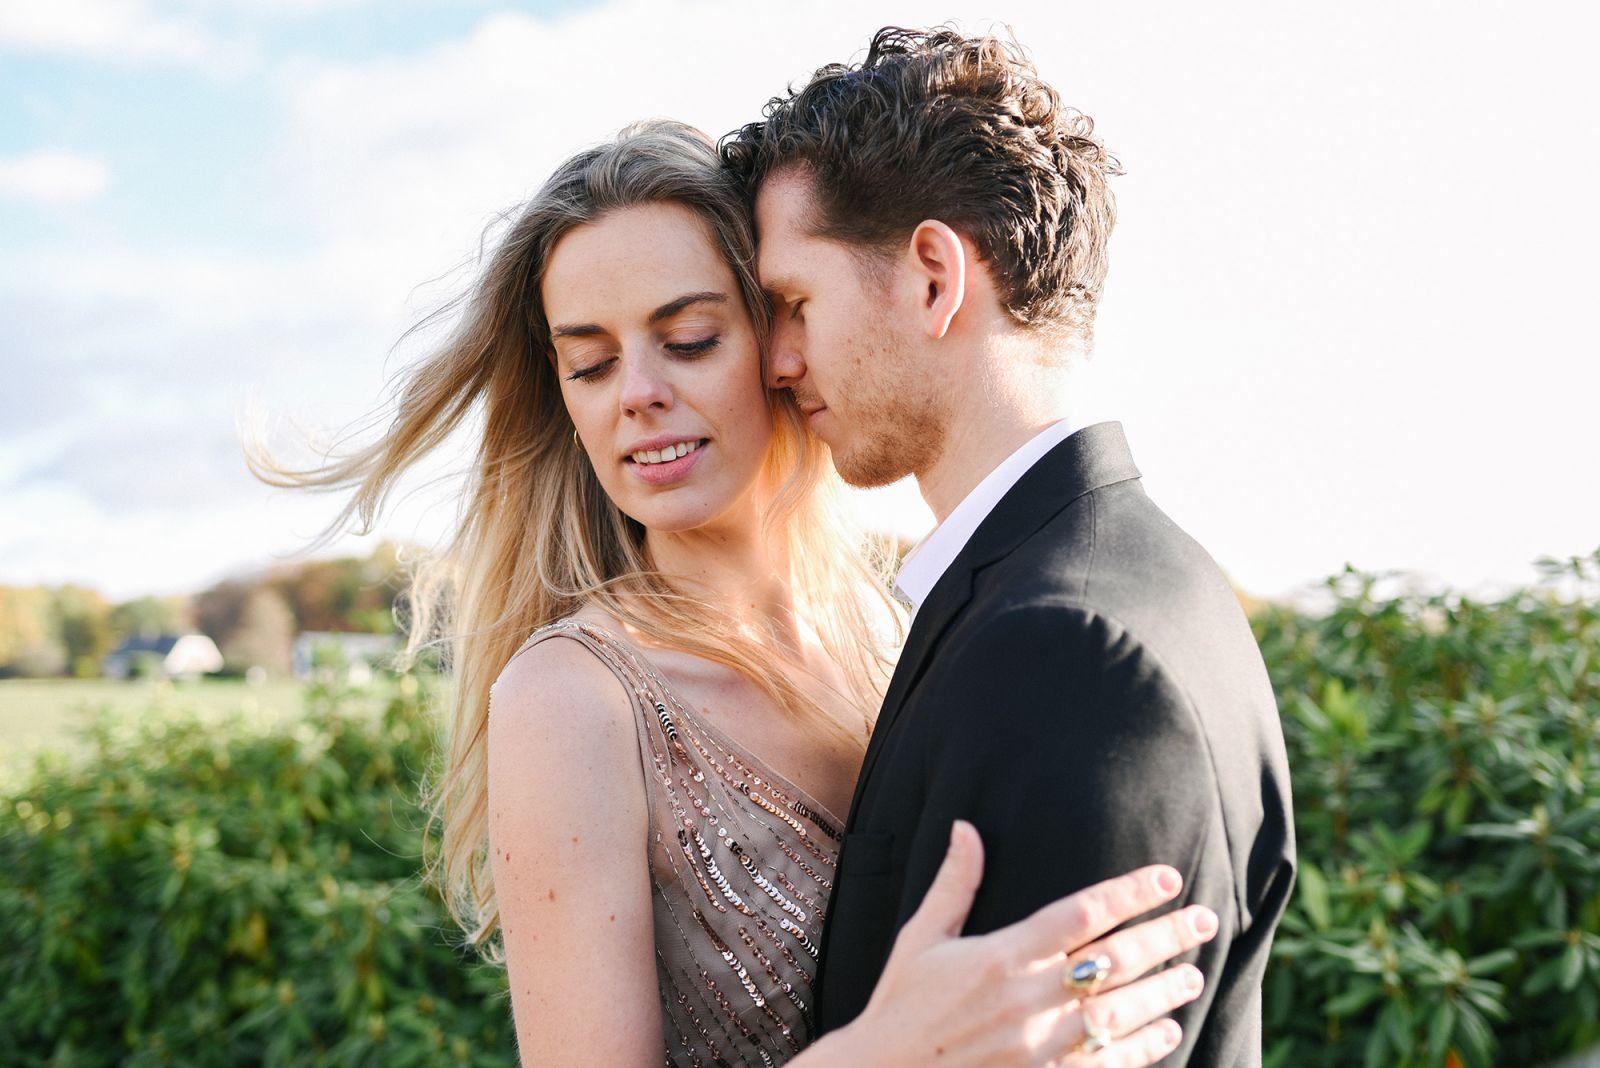 Verliefdm verloofd, bruidsfotografie, loveshoot, bruidsfotograaf, Culemborg, fotograafculemborg